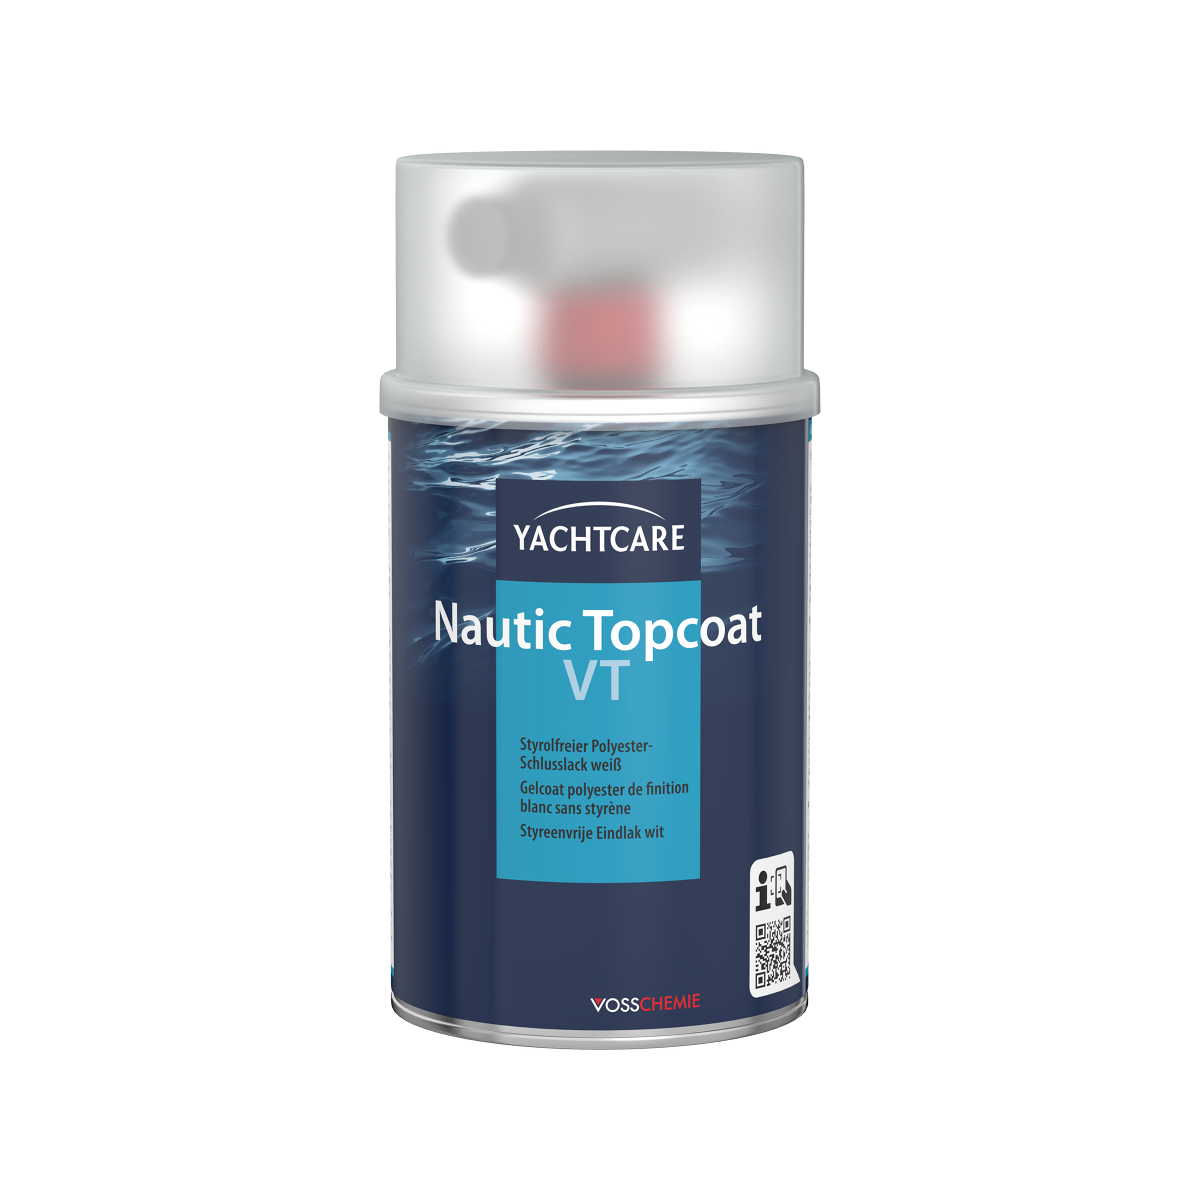 Yachtcare Nautic Topcoat VT styreenvrije eindlak wit - 500g